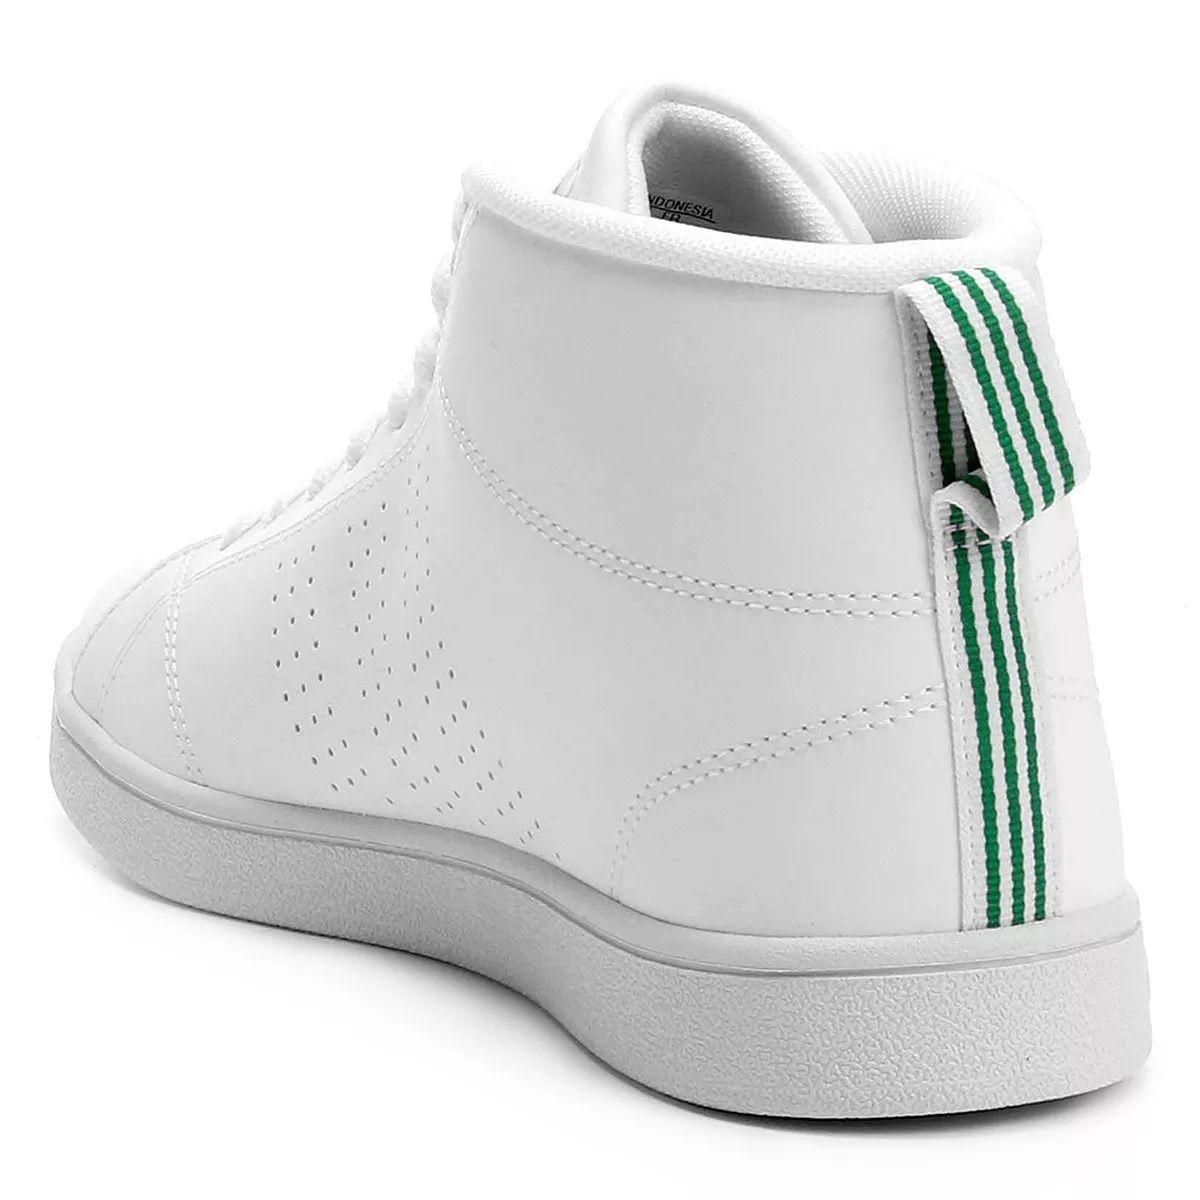 Tênis Adidas Advantage Clean Mid masculino Branco